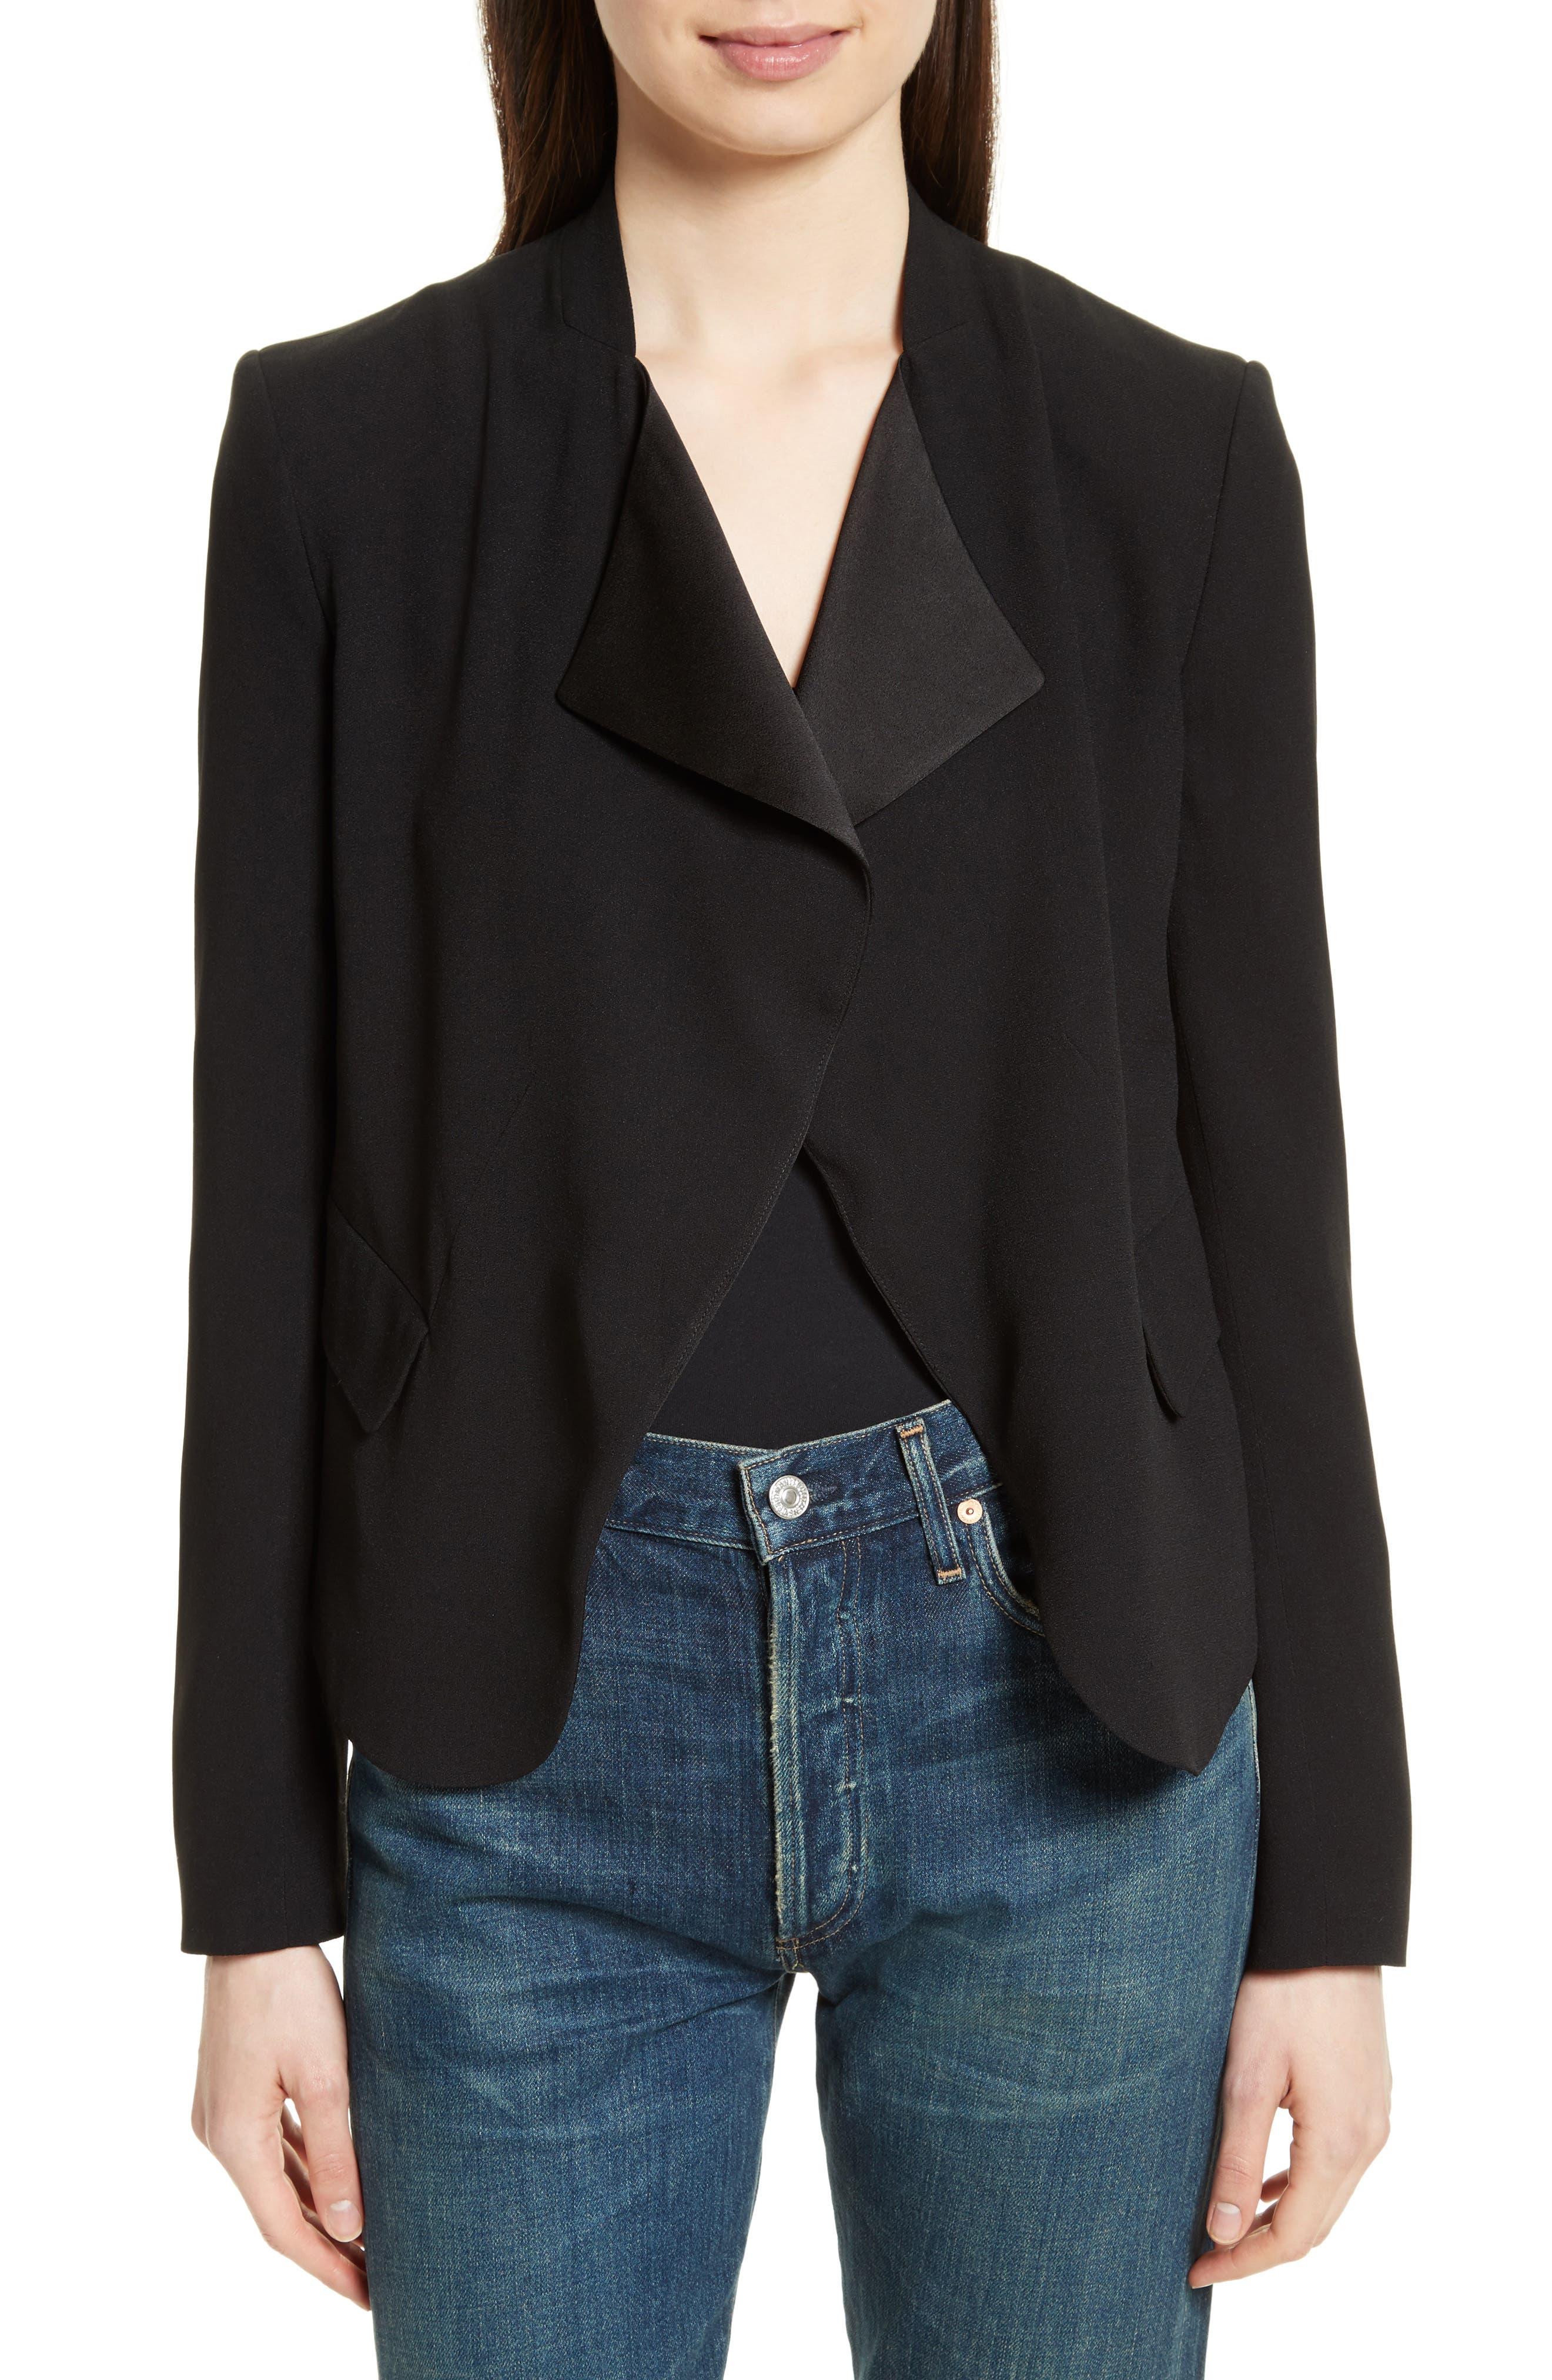 Kensington Peplum Jacket,                         Main,                         color, 001